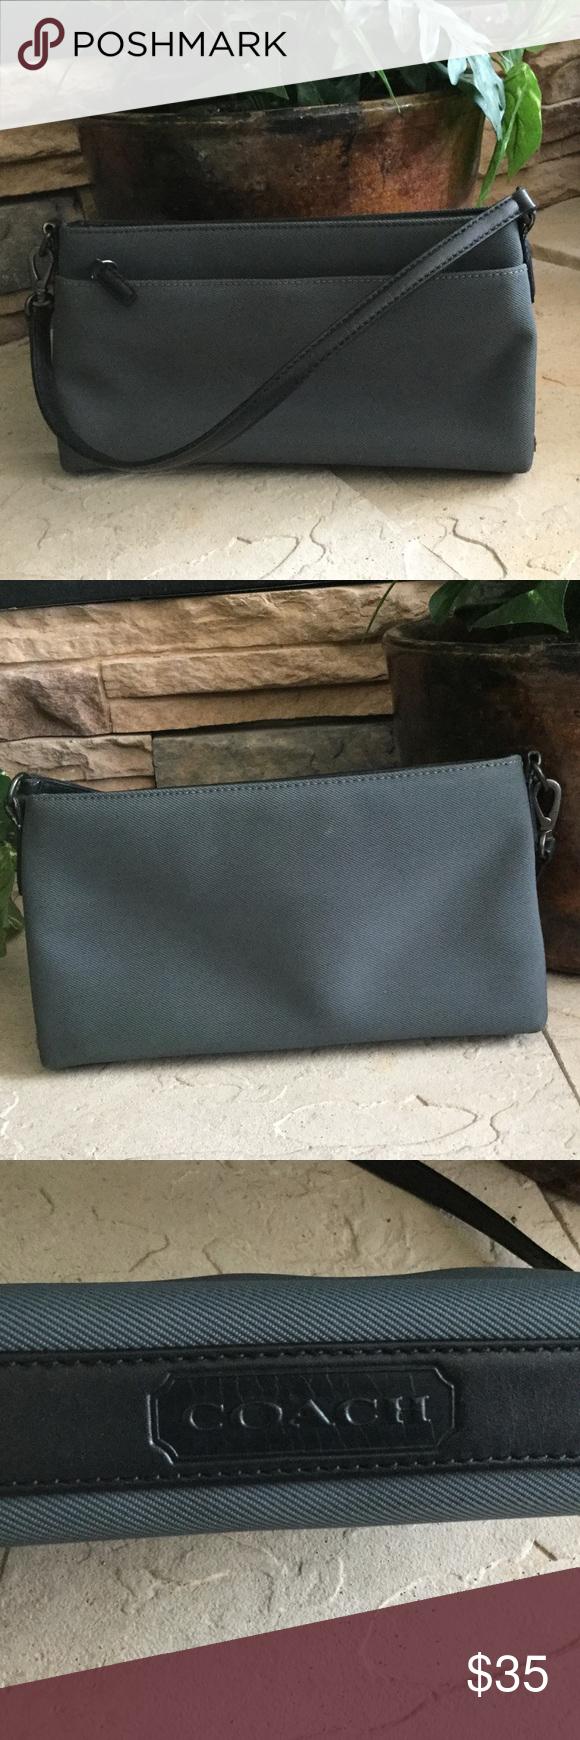 5da831273d ... new zealand coach handbag wristlet gently used coach wristlet. coach  bags clutches wristlets 968cc 2bf15